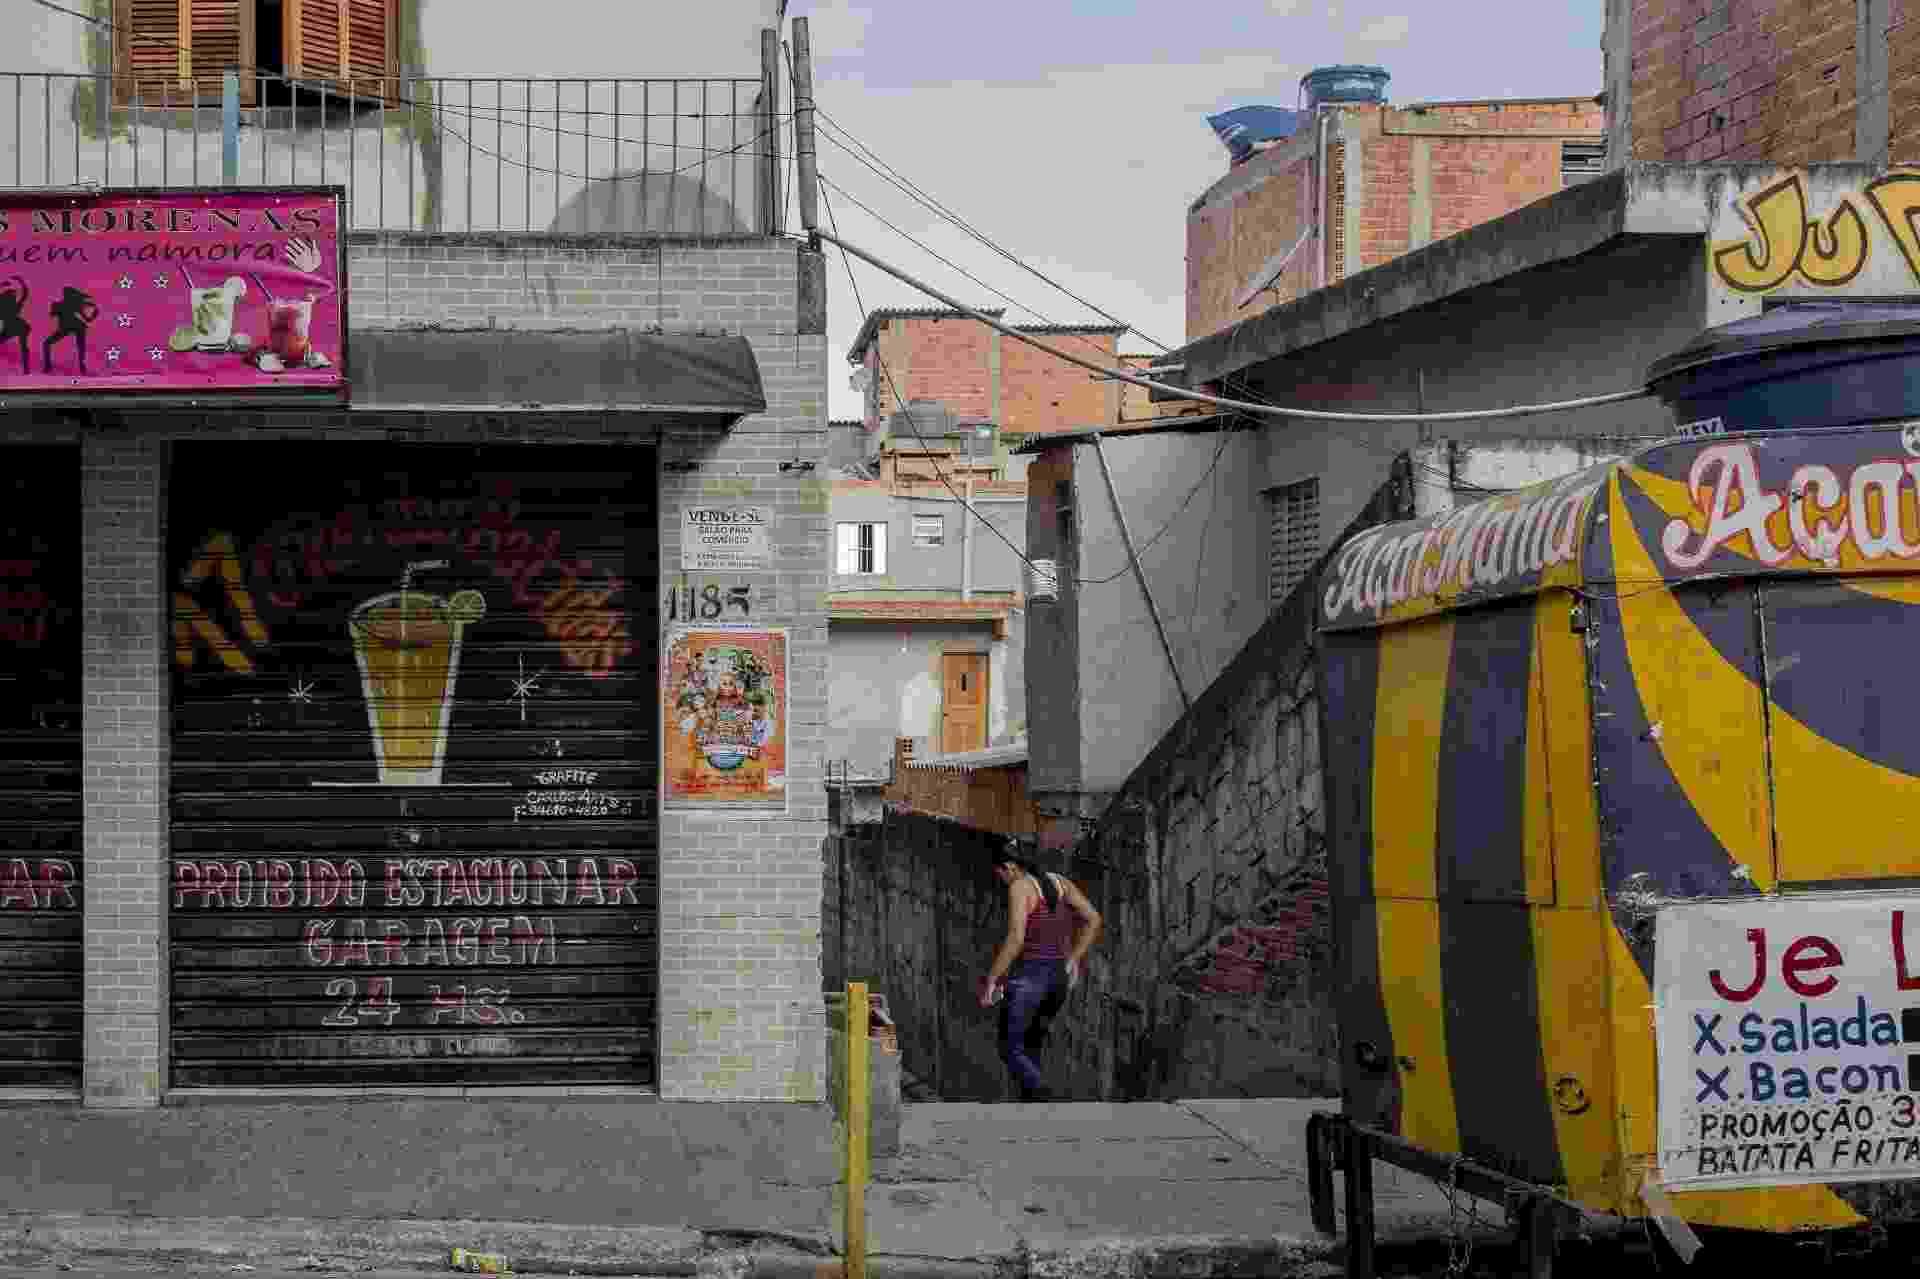 Paraisópolis - Adriano Vizoni/Folhapress